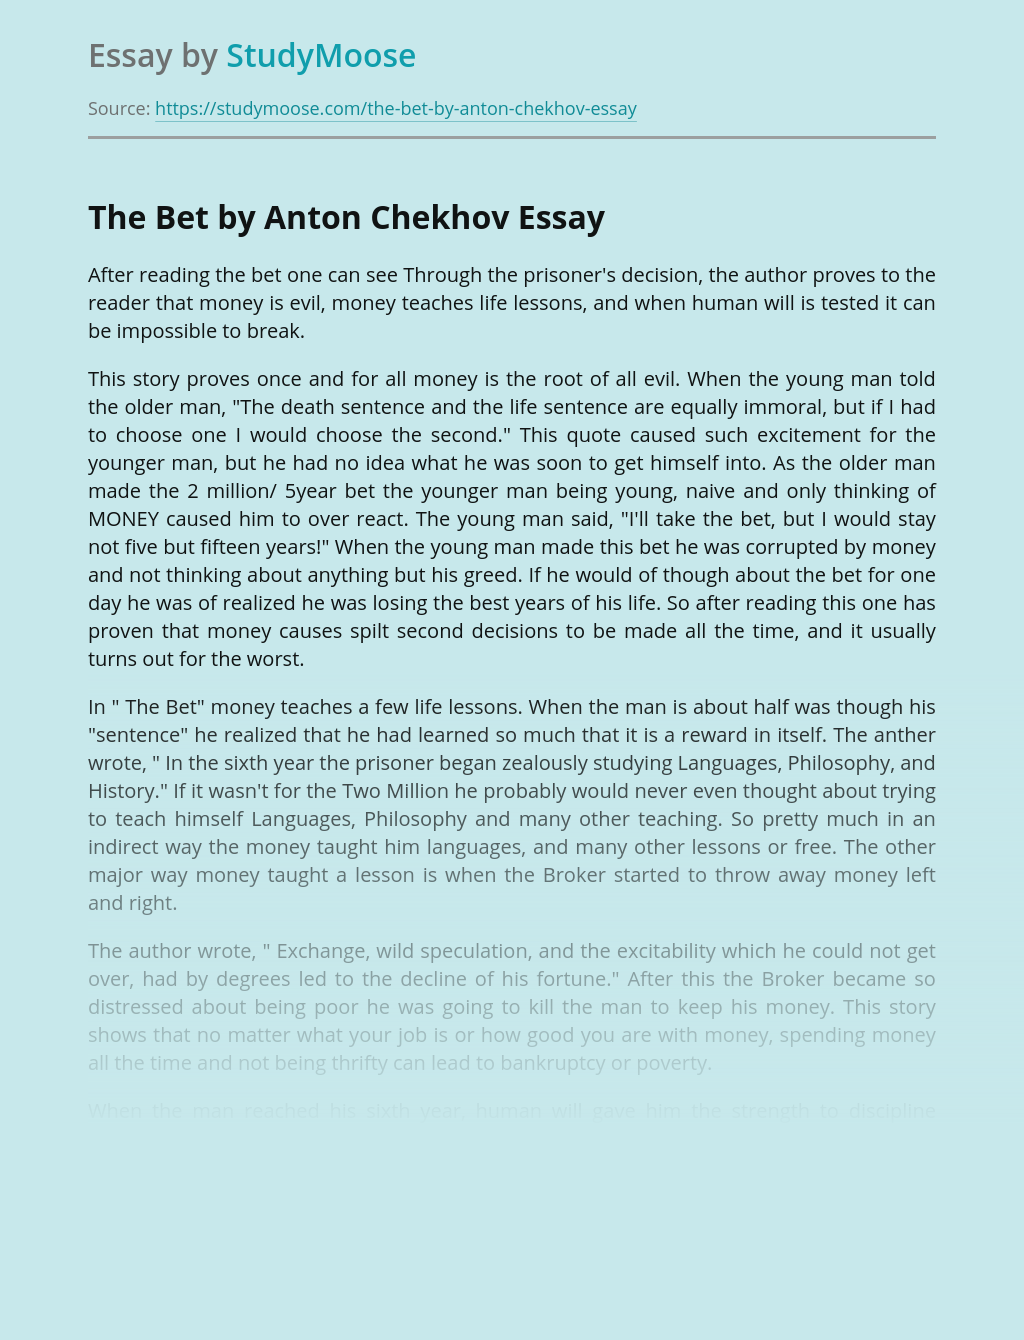 Life Lessons in Anton Chekhov's The Bet